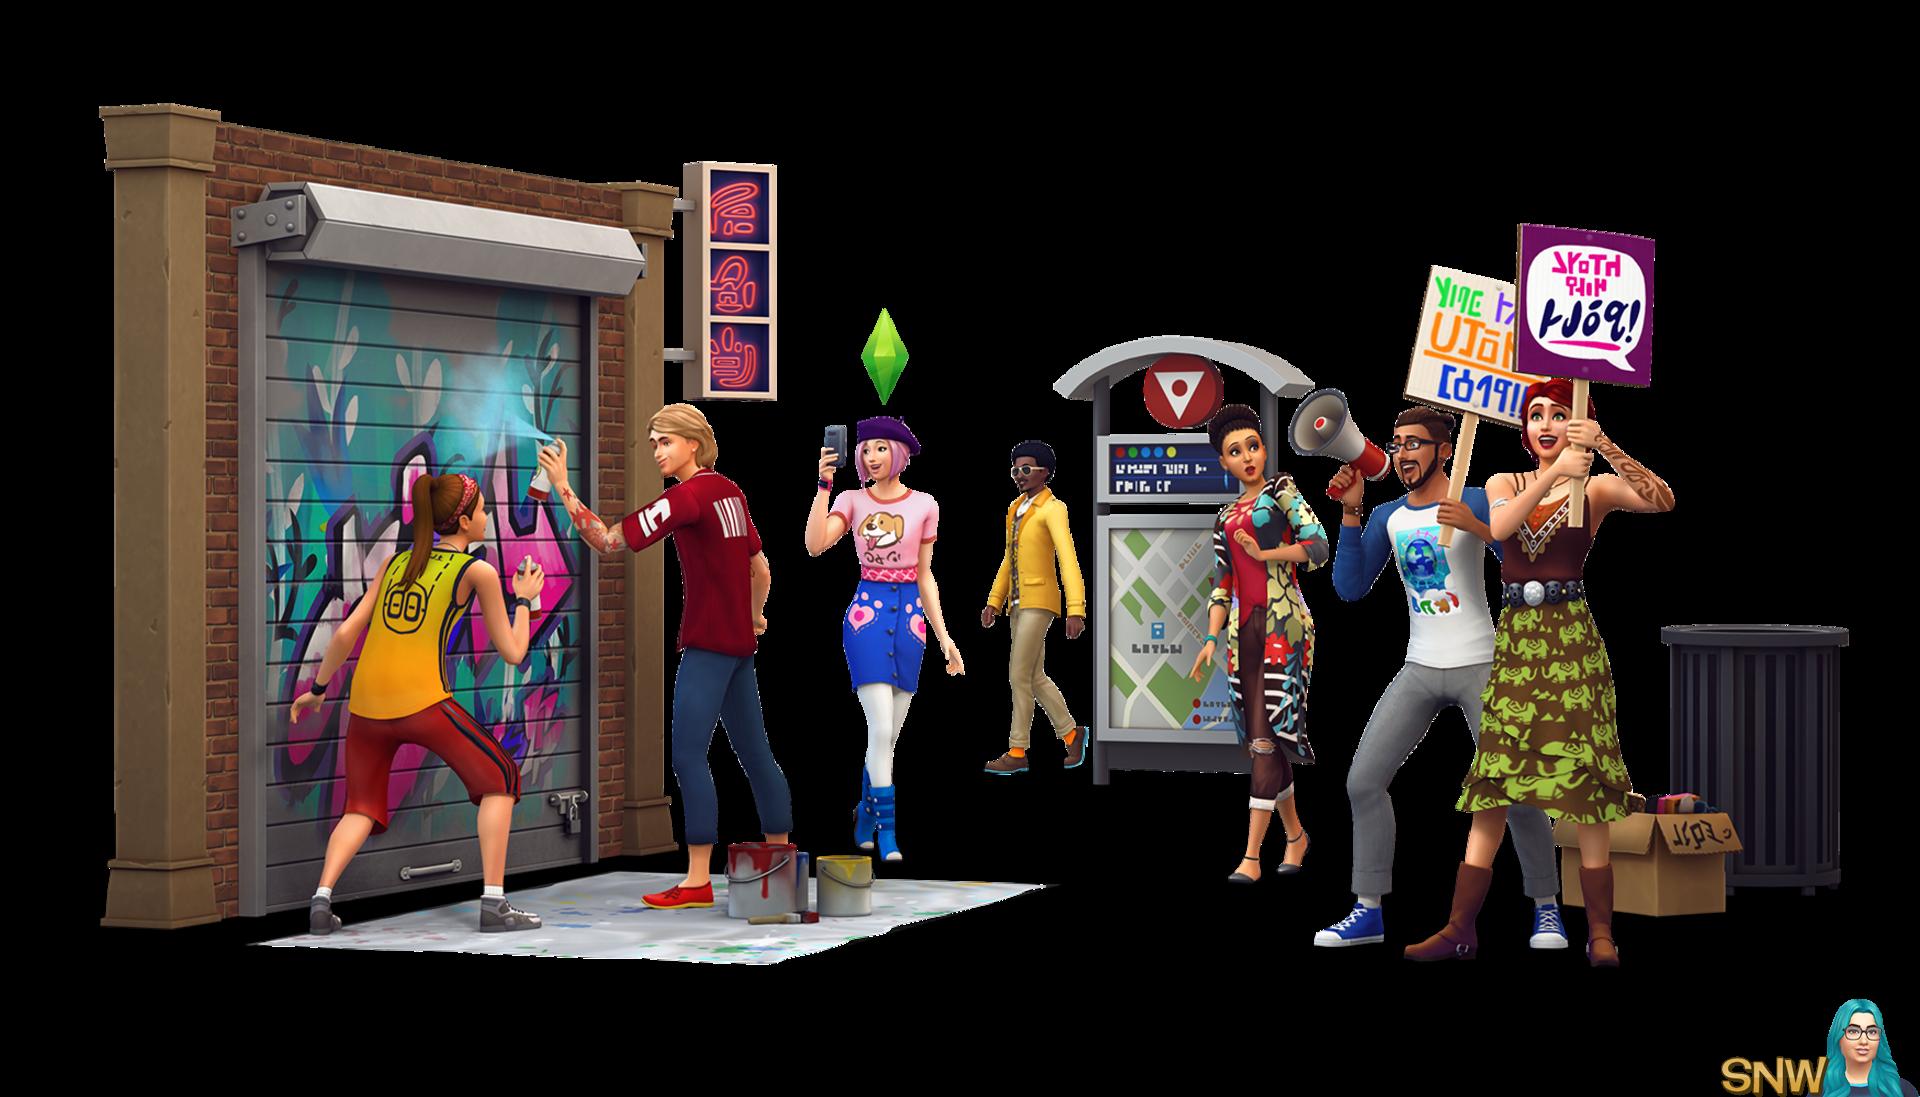 The Sims 4: City Living render / De Sims 4: Stedelijk Leven render